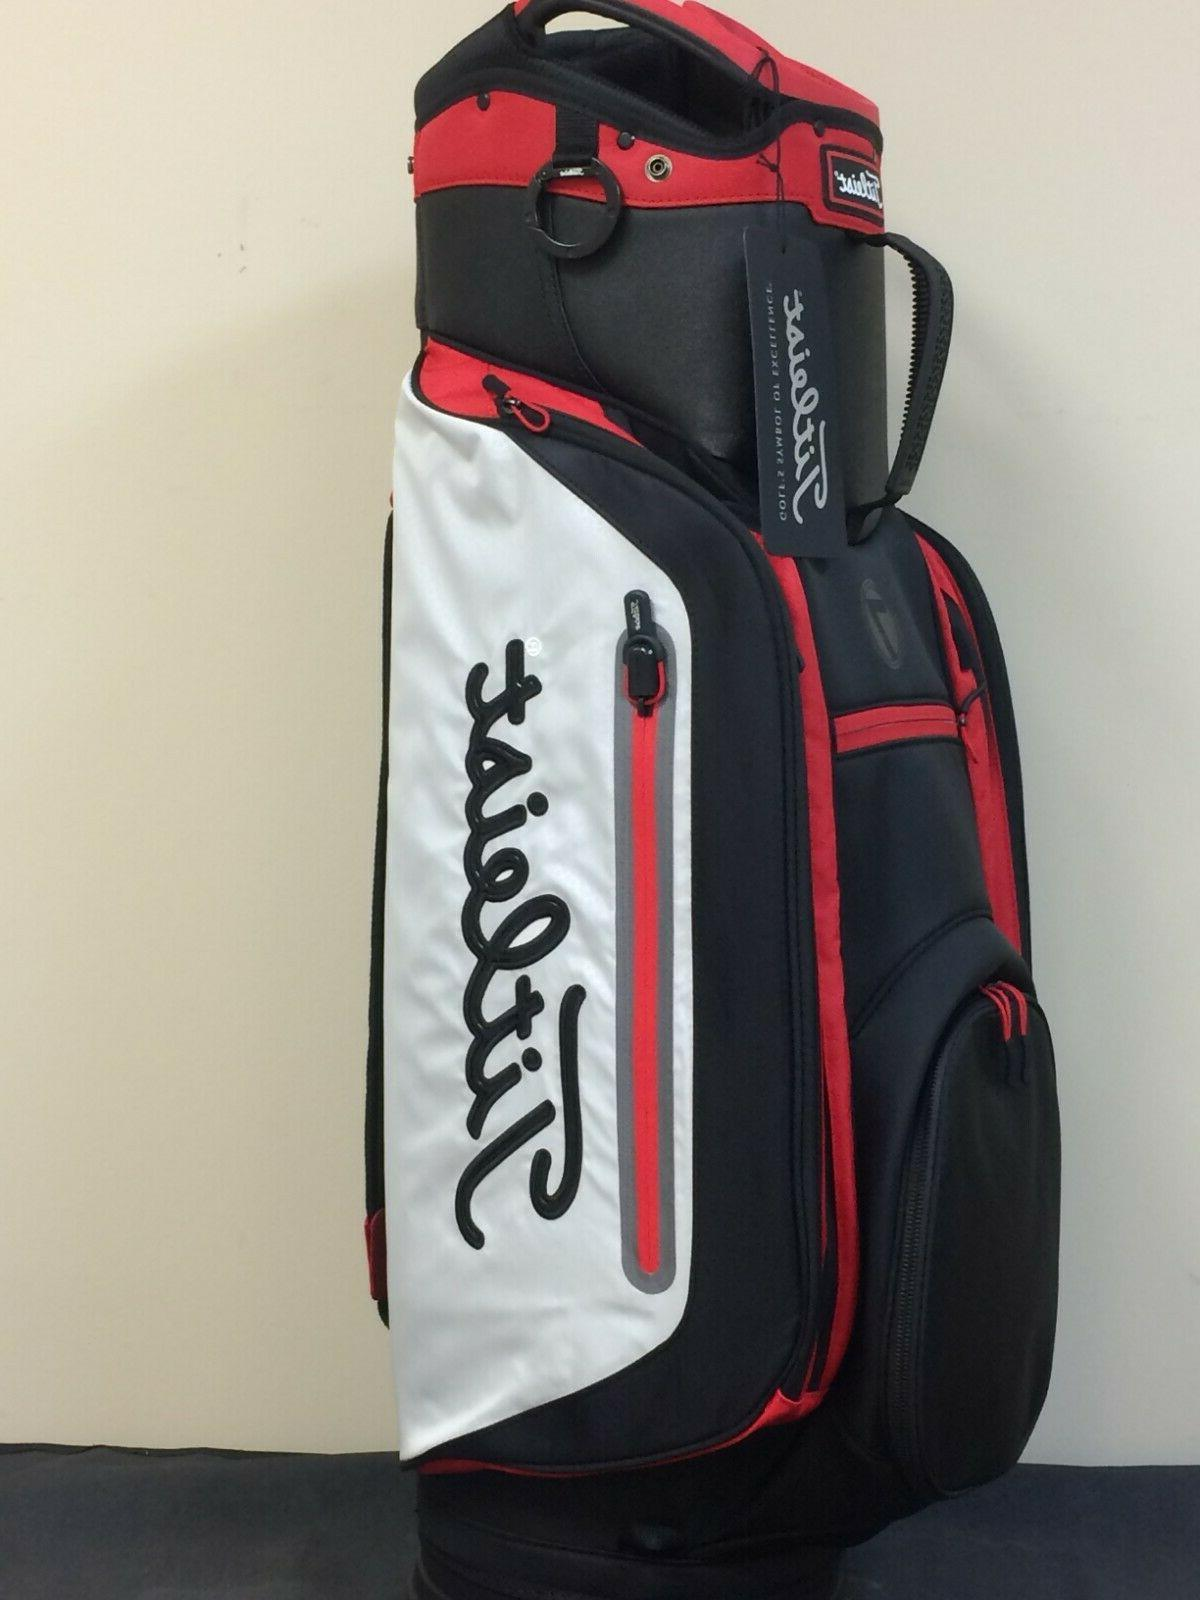 2018 golf cb club 7 cart bag